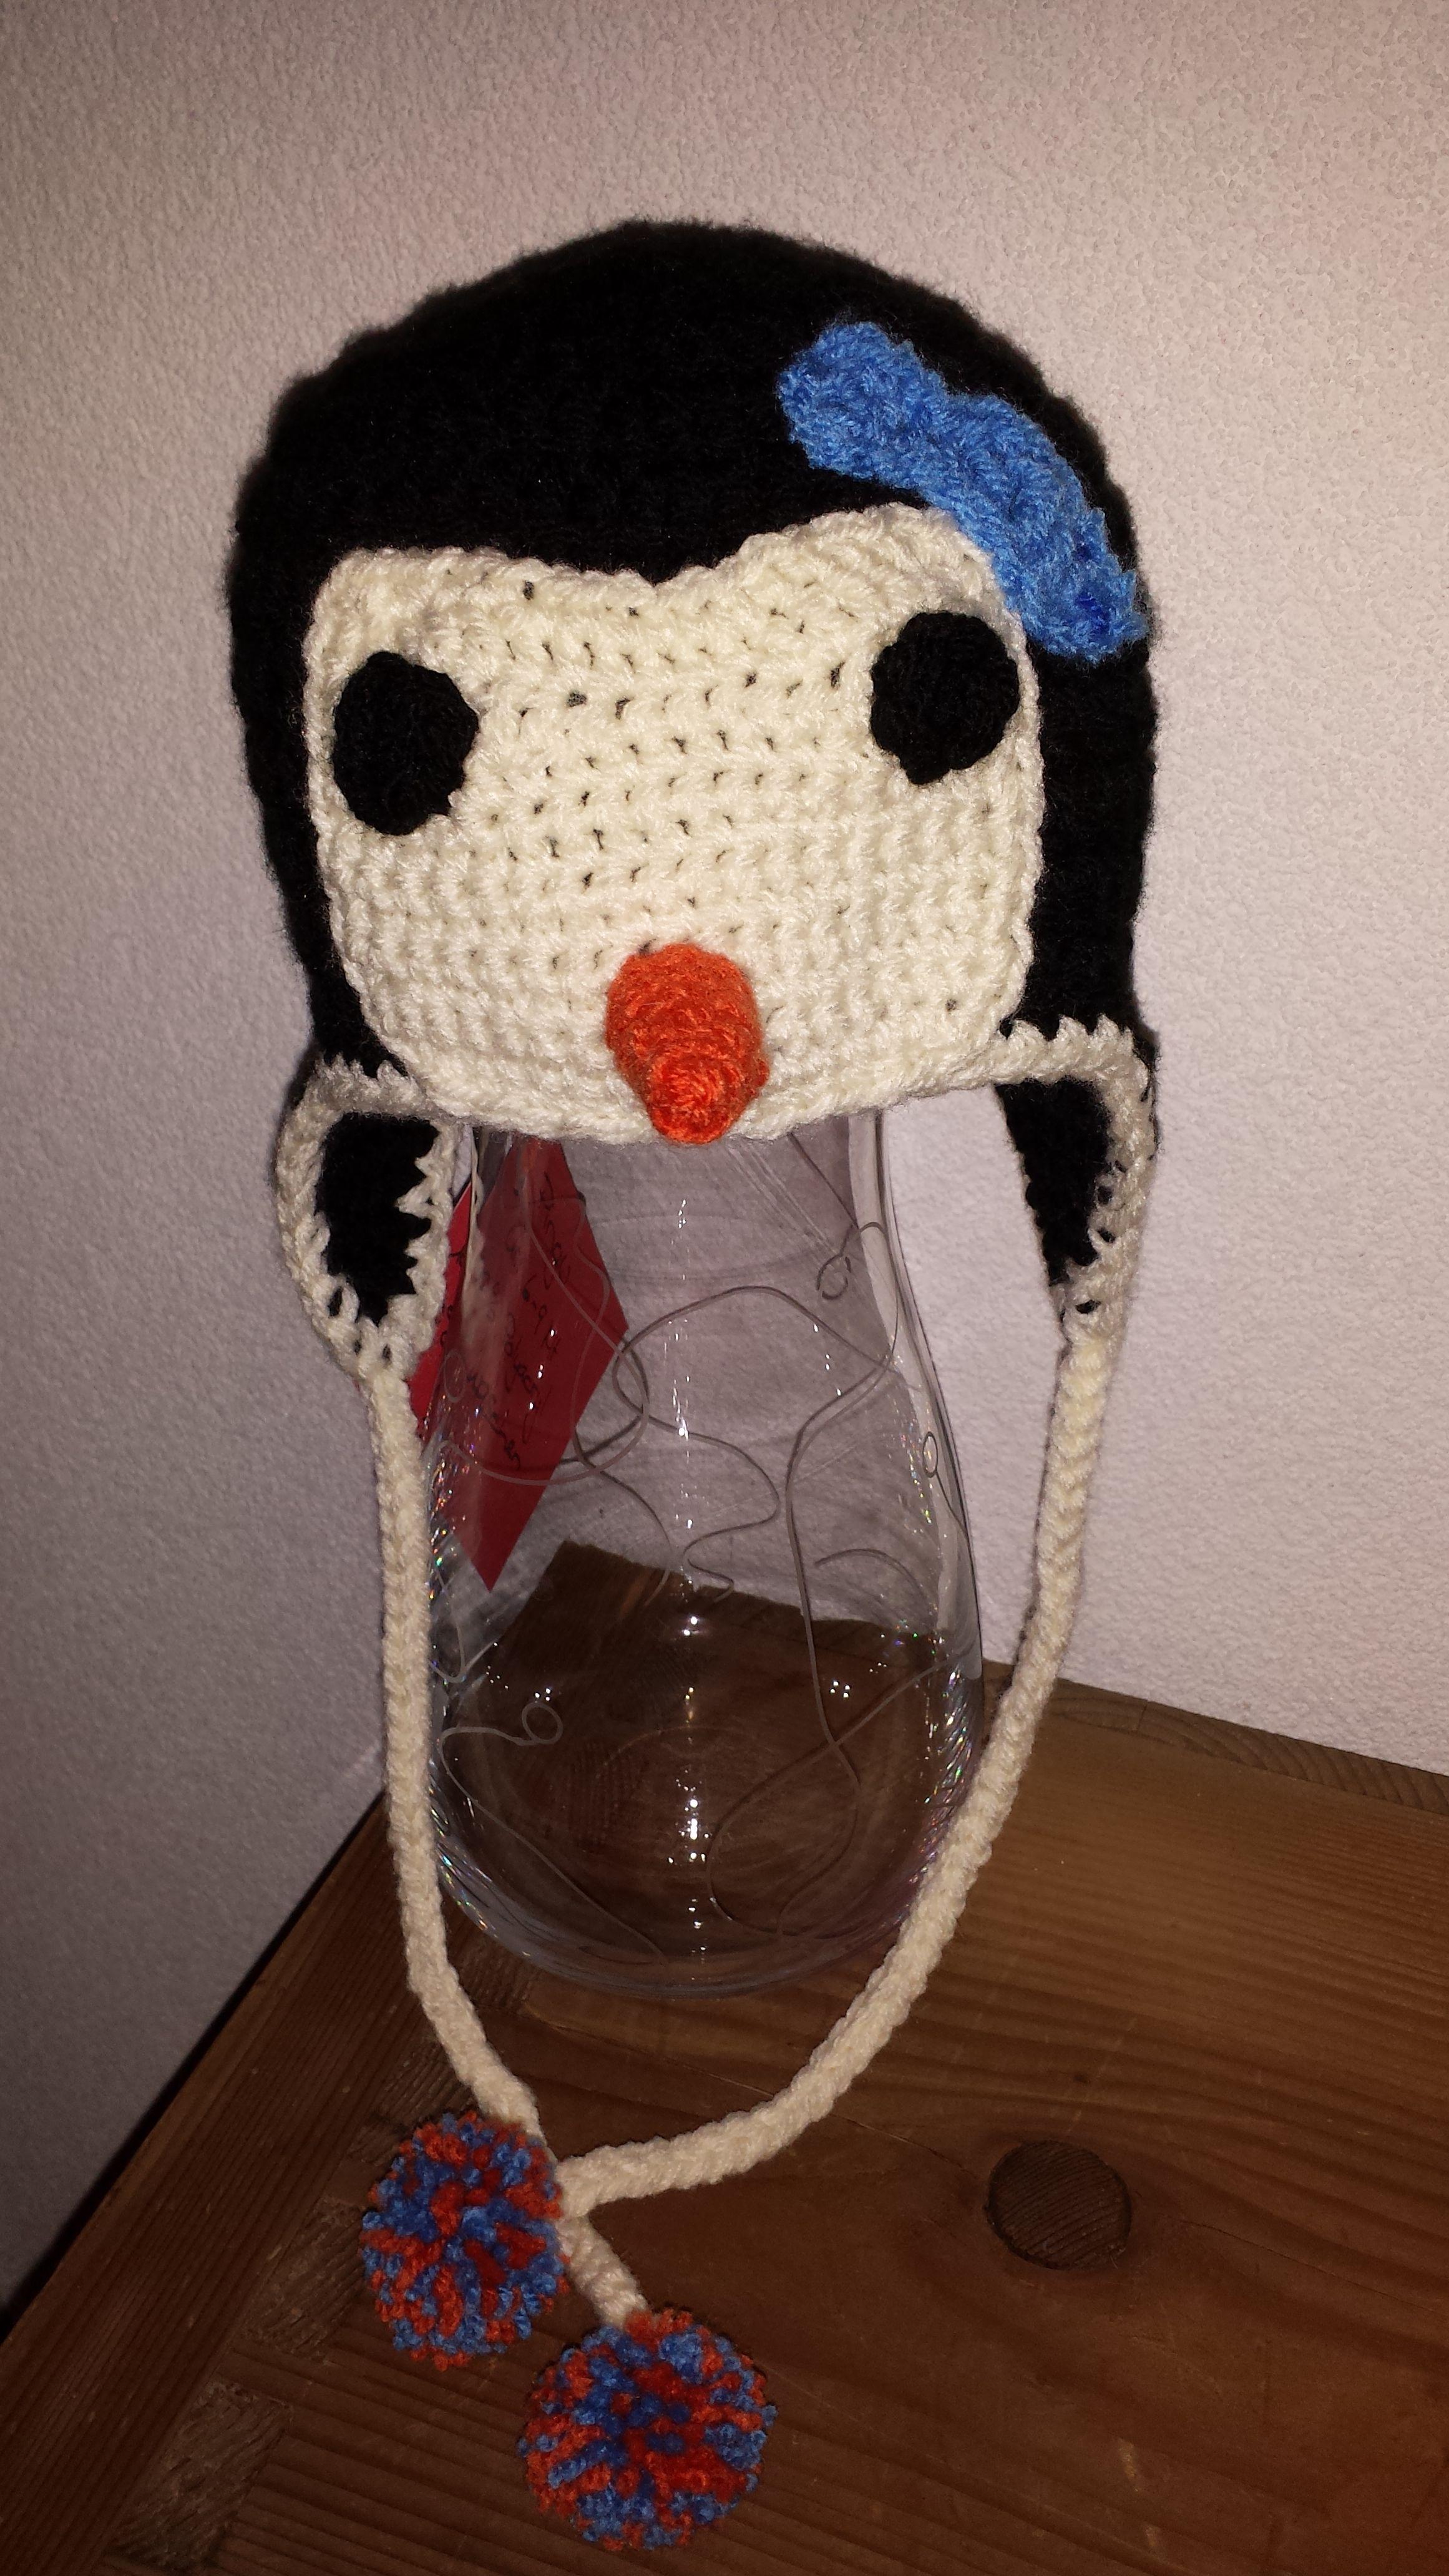 Pinguin Mütze, häkeln nach Anleitung: http://www.repeatcrafterme.com ...